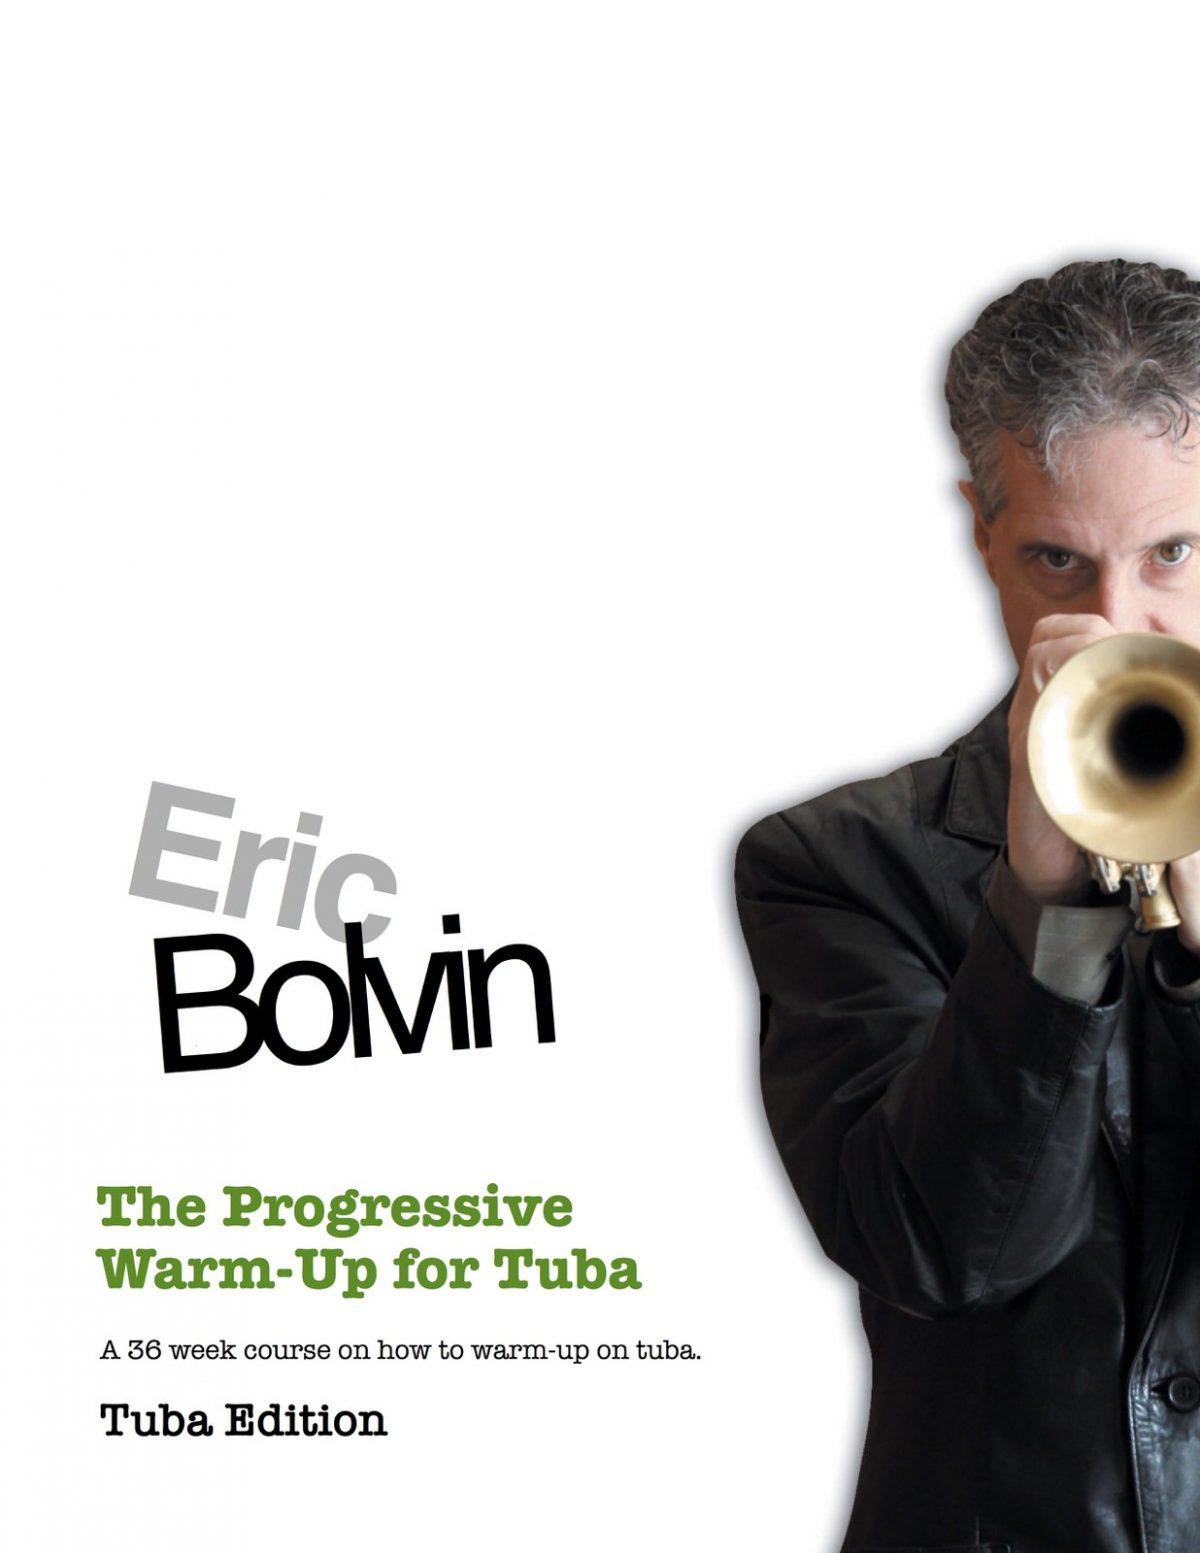 The Progressive Warm-Up for Tuba